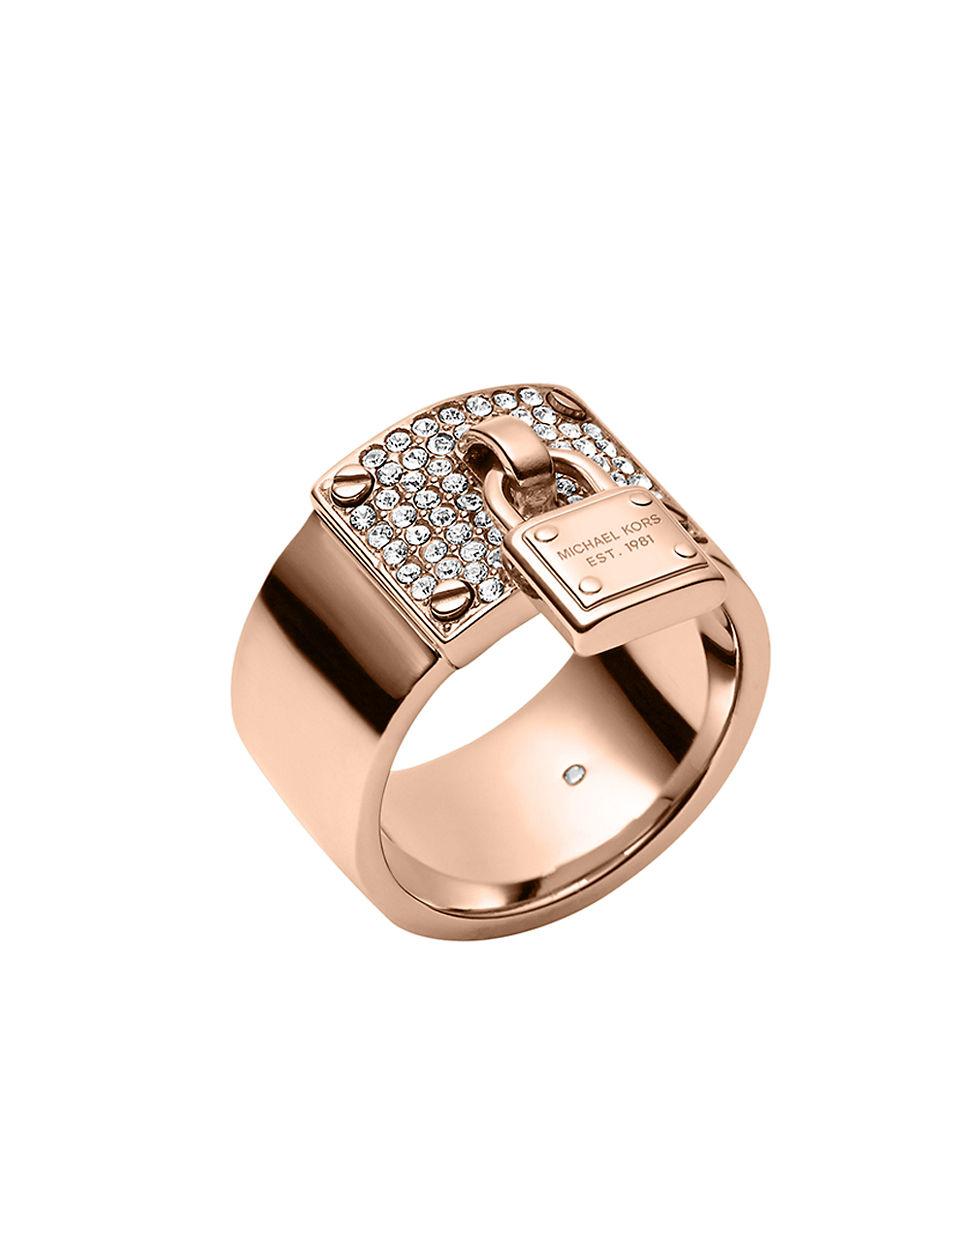 michael kors rose goldtone crystallized plaque ring with padlock charm in pink rose gold lyst. Black Bedroom Furniture Sets. Home Design Ideas